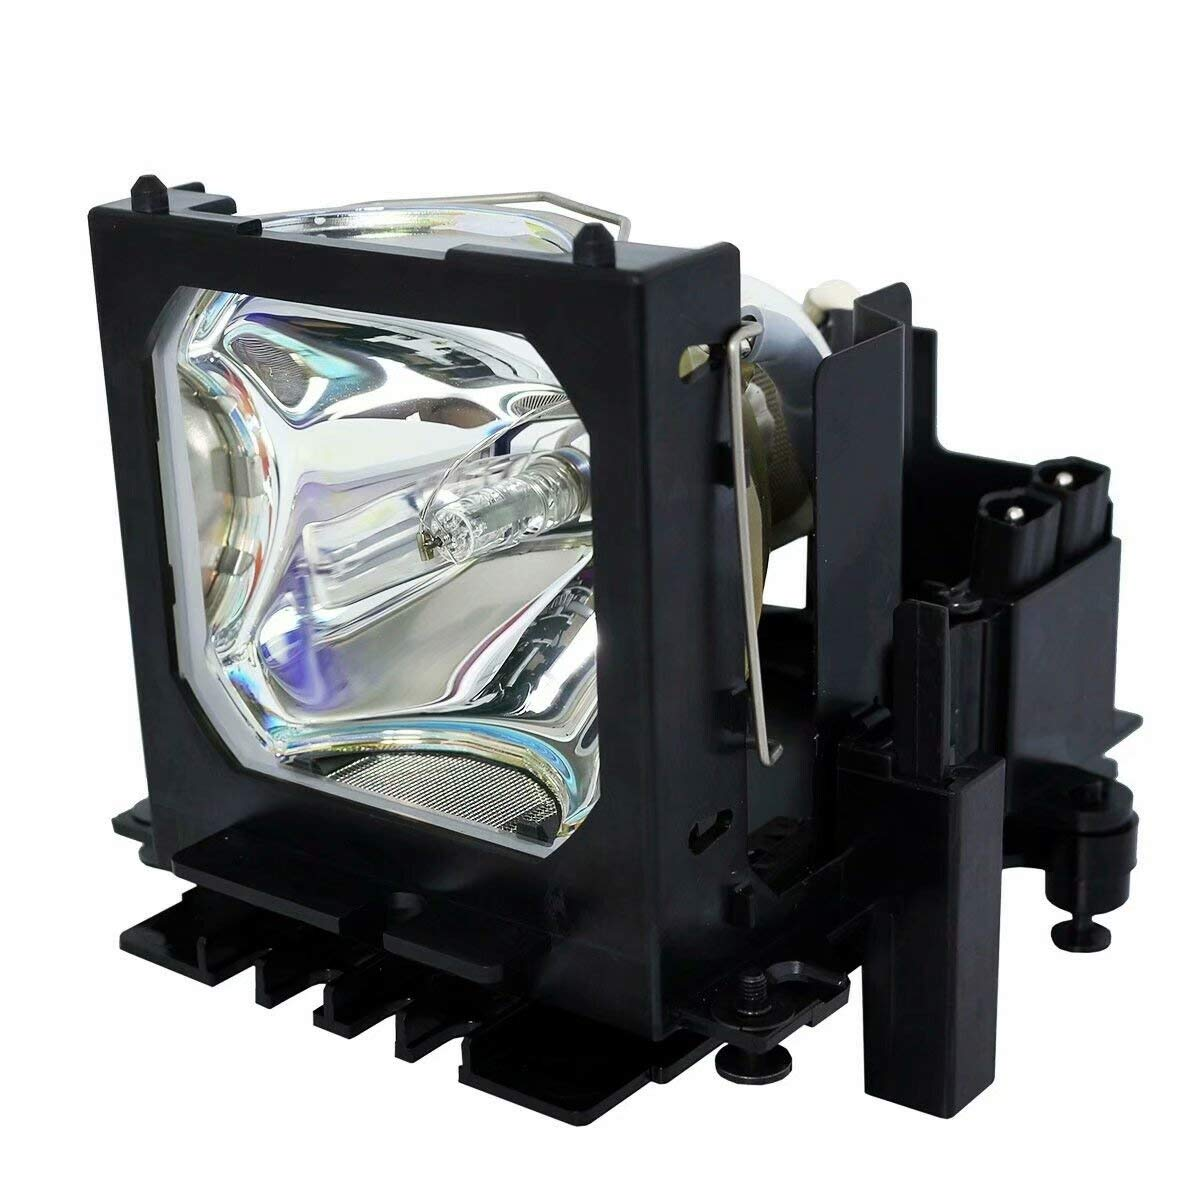 SP-LAMP-016 lámpara de proyector para preguntar C450 C460 Proxima DP8500X Infocus LP850 LP860 Liesegang DV560 DV880 Flex Toshiba TLP-LX45